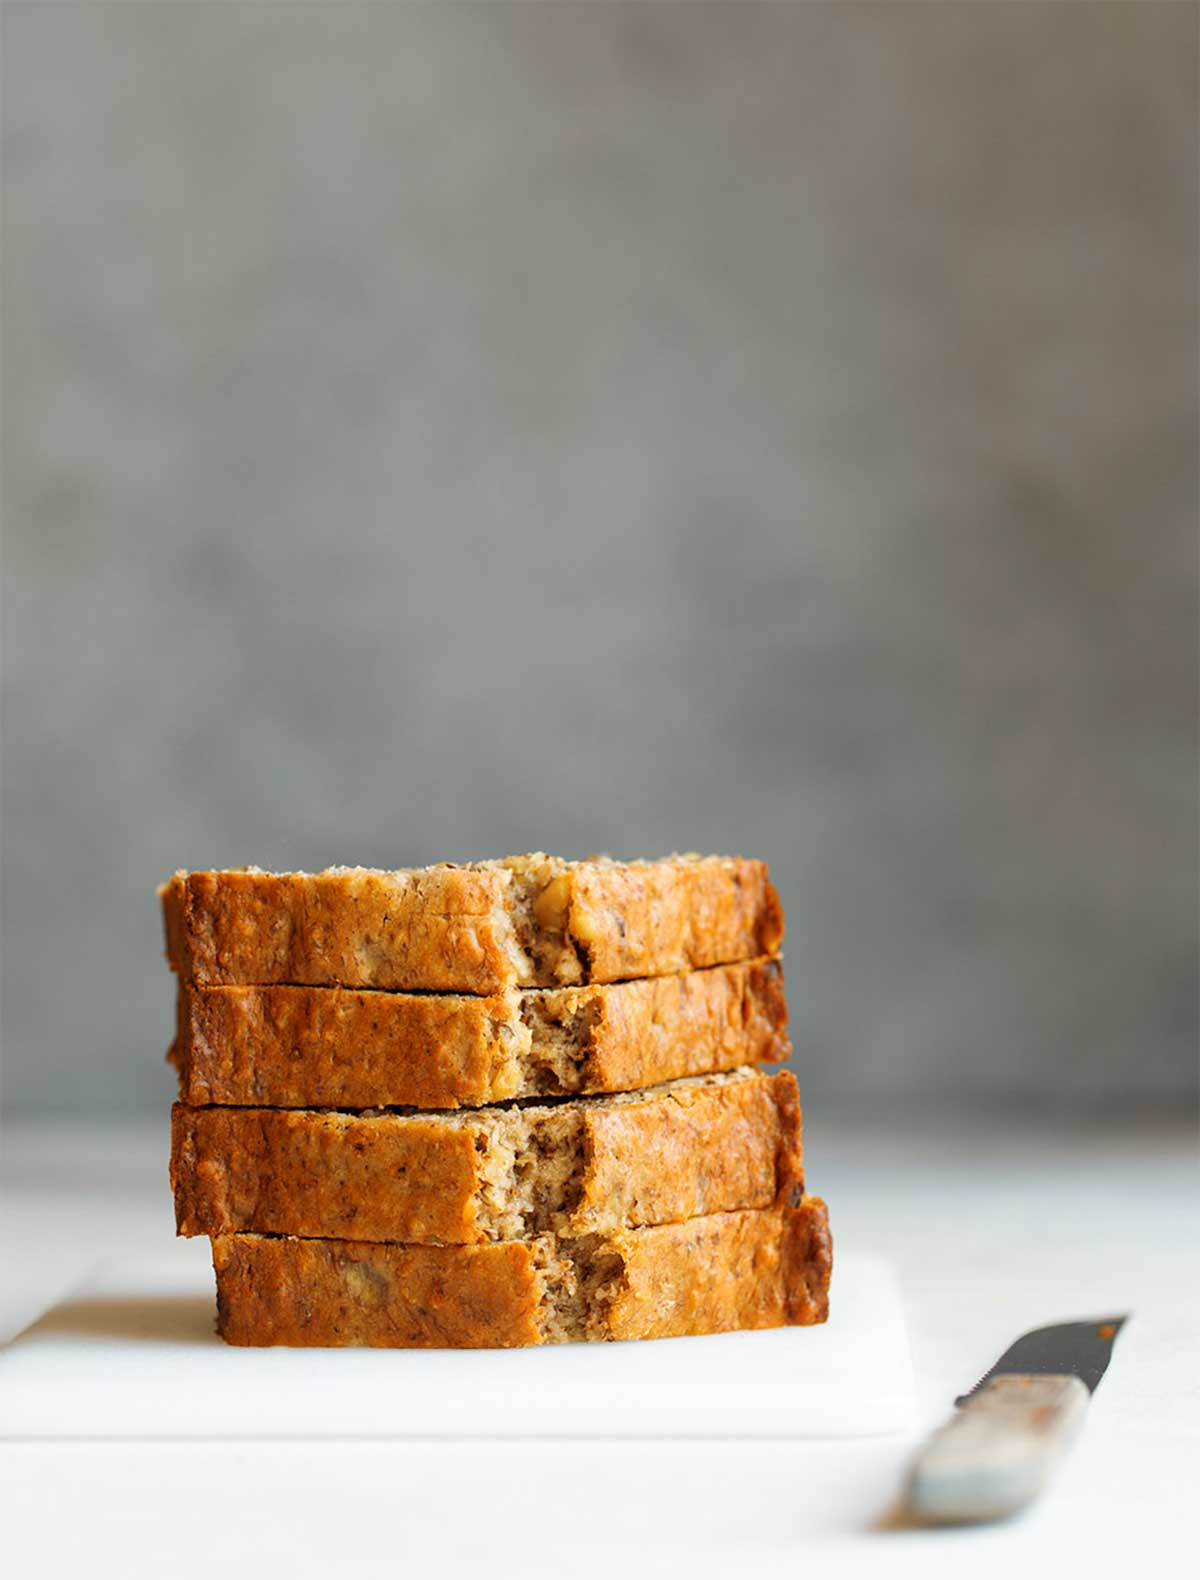 Slices of glazed nutmeg pound cake on a white cutting board